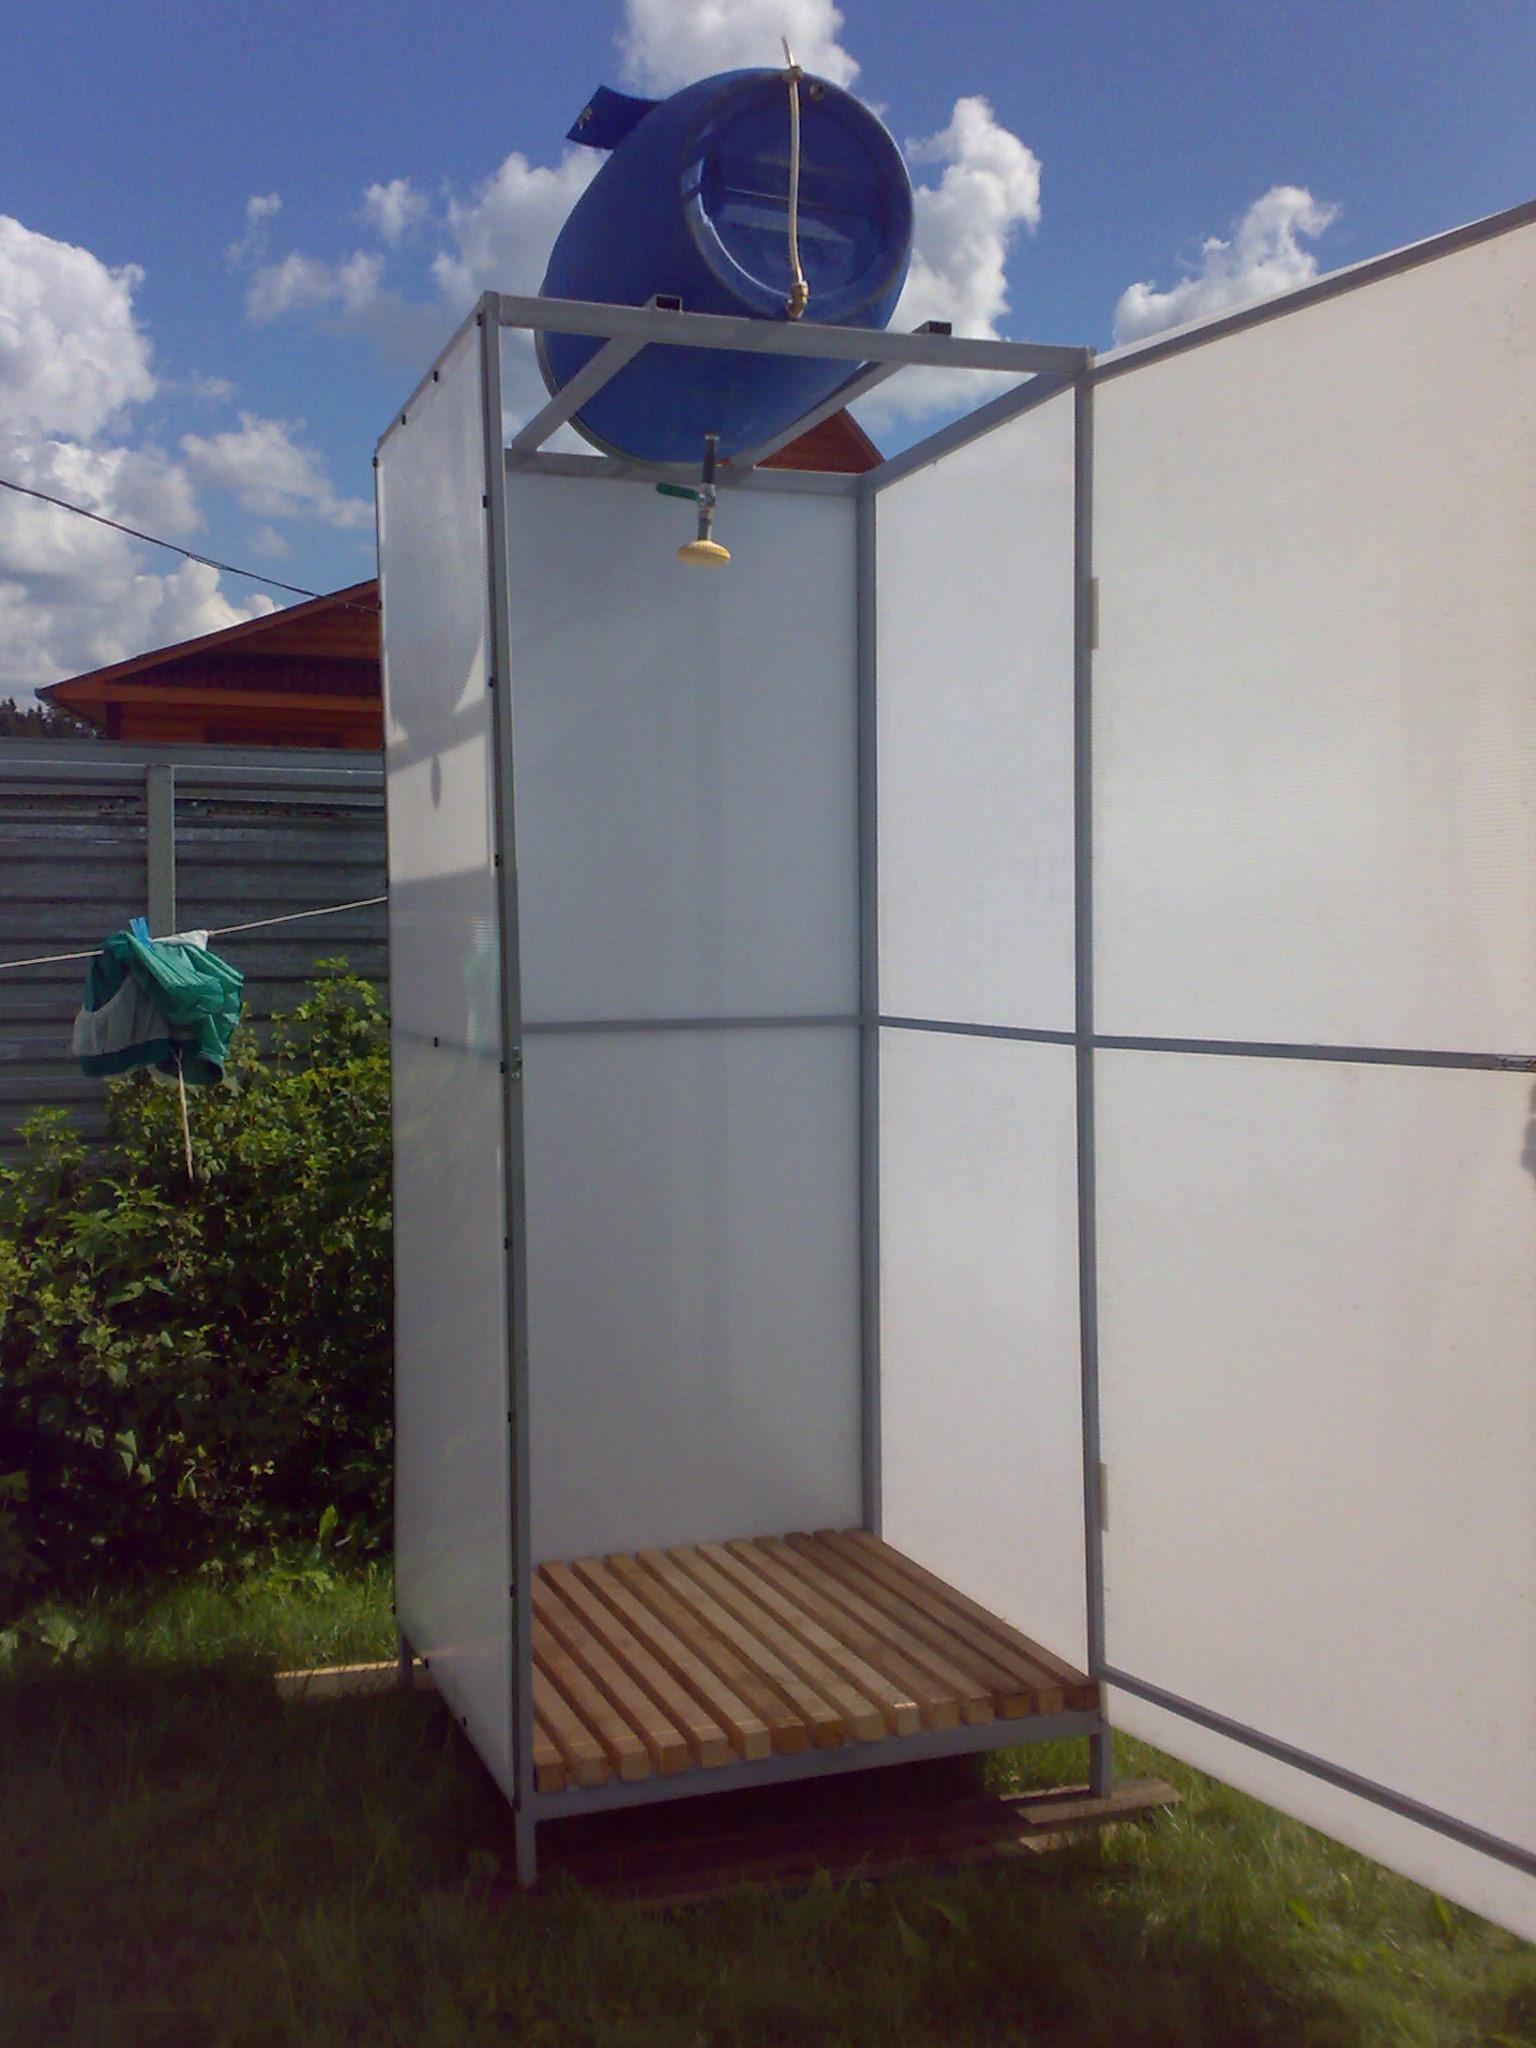 Душевая кабина на участке из металла и поликарбоната